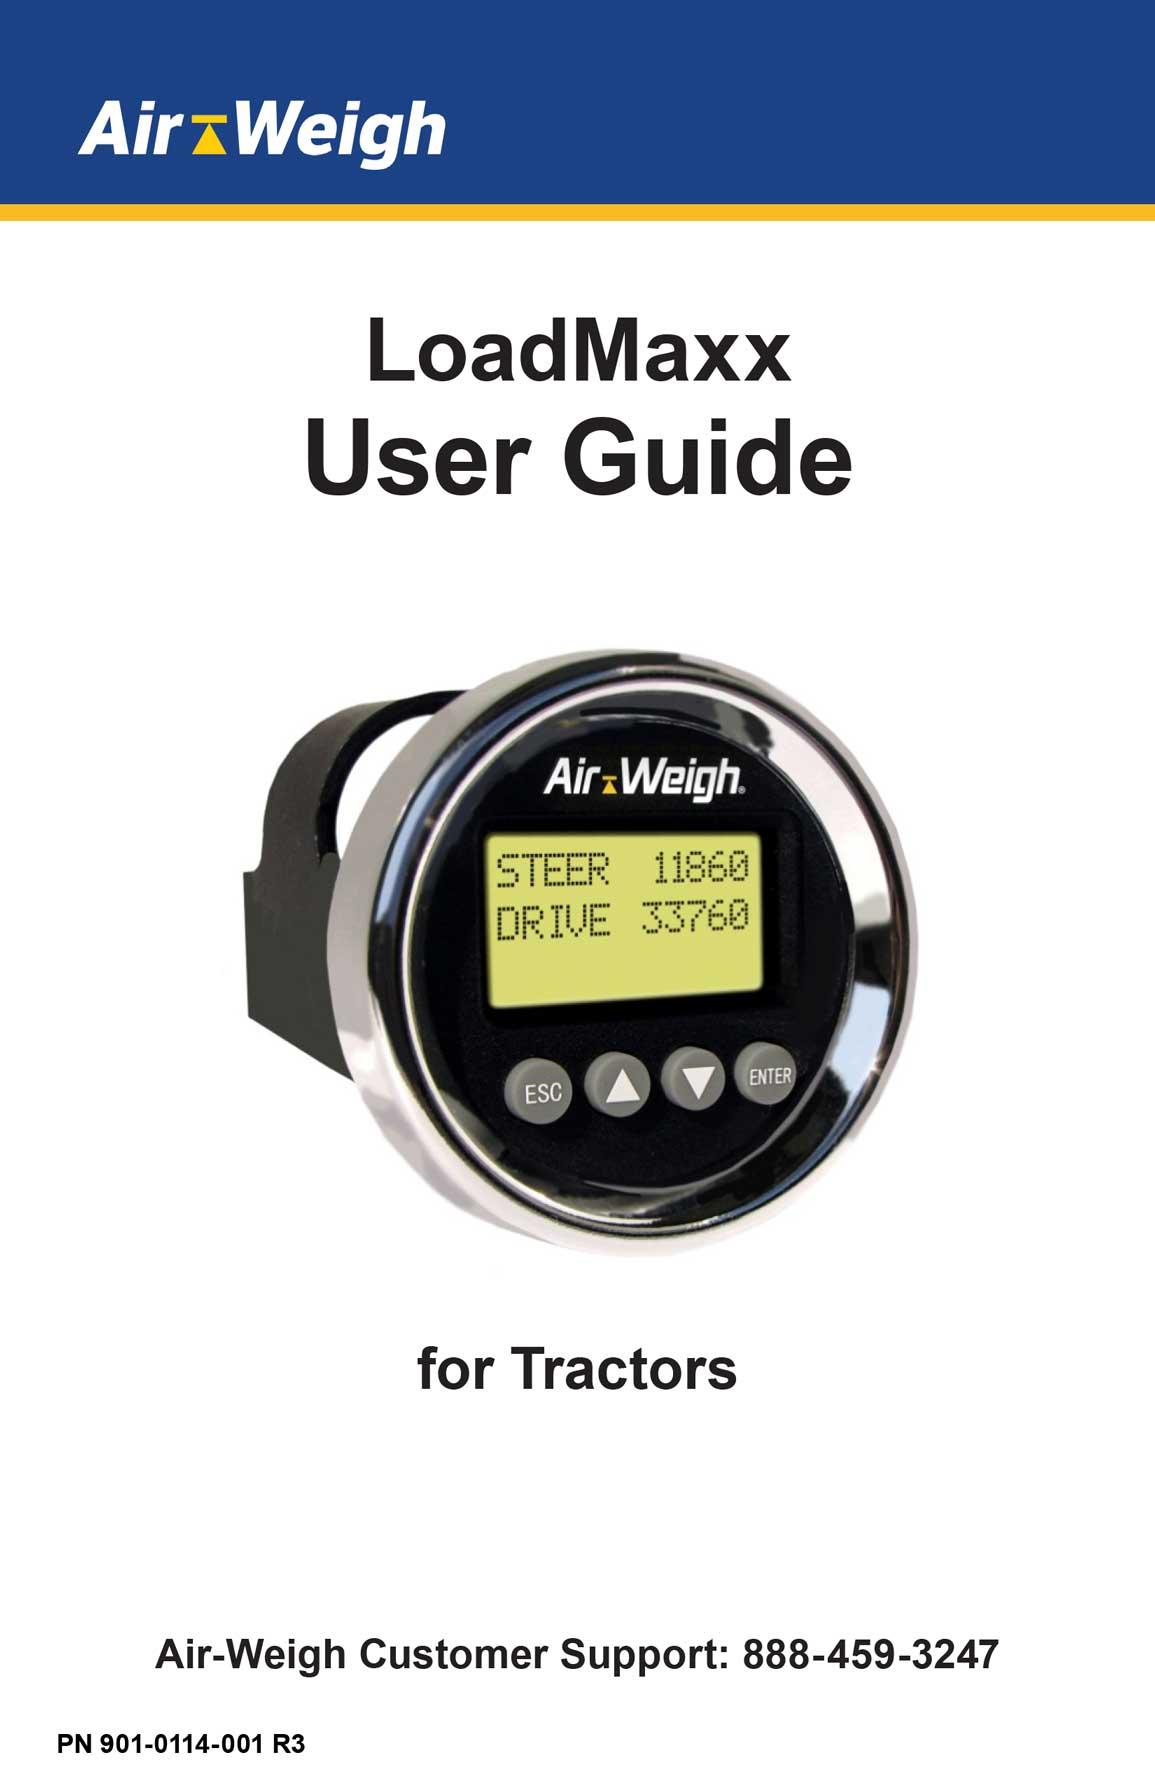 LoadMaxx User Guide for Tractors